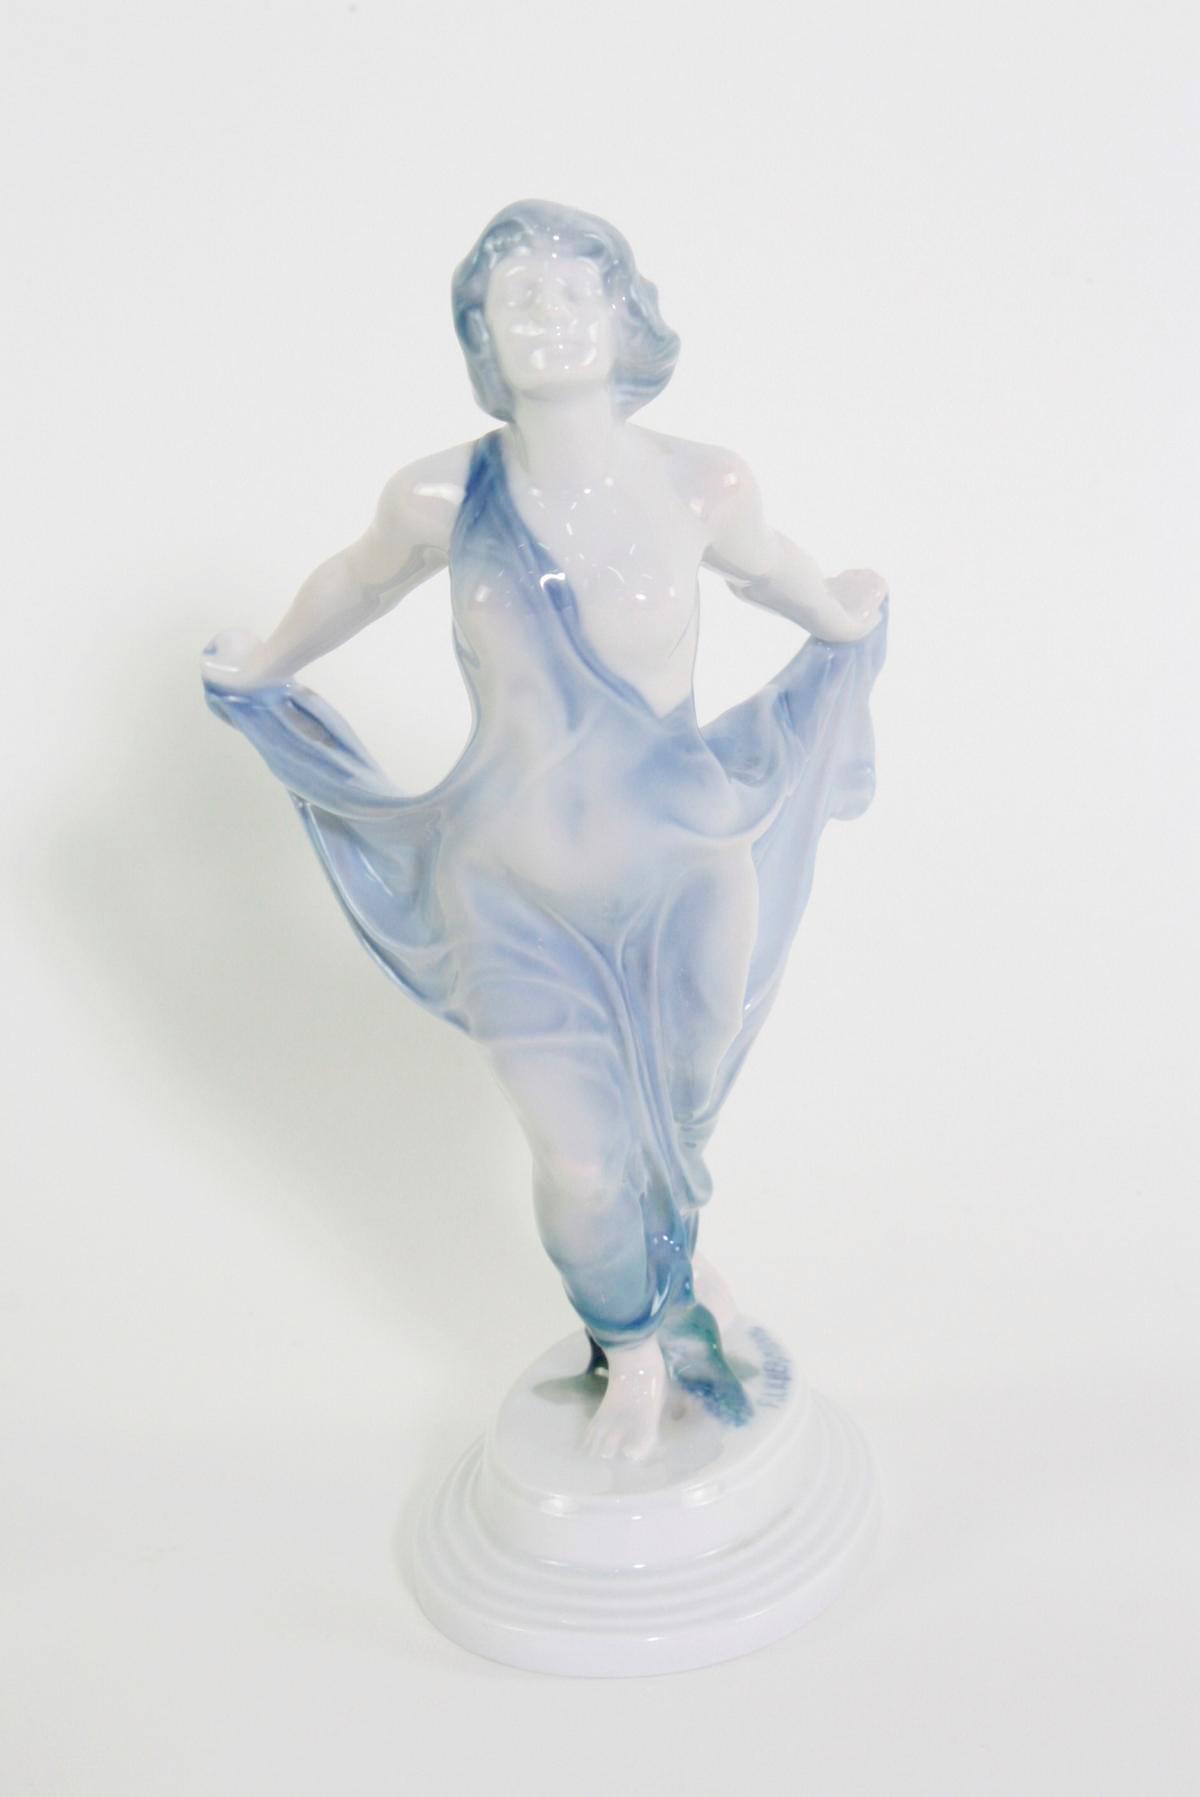 Porzellanskulptur, 'Tänzerin', Rosenthal, Kunst-Abteilung, 1920er Jahre-2